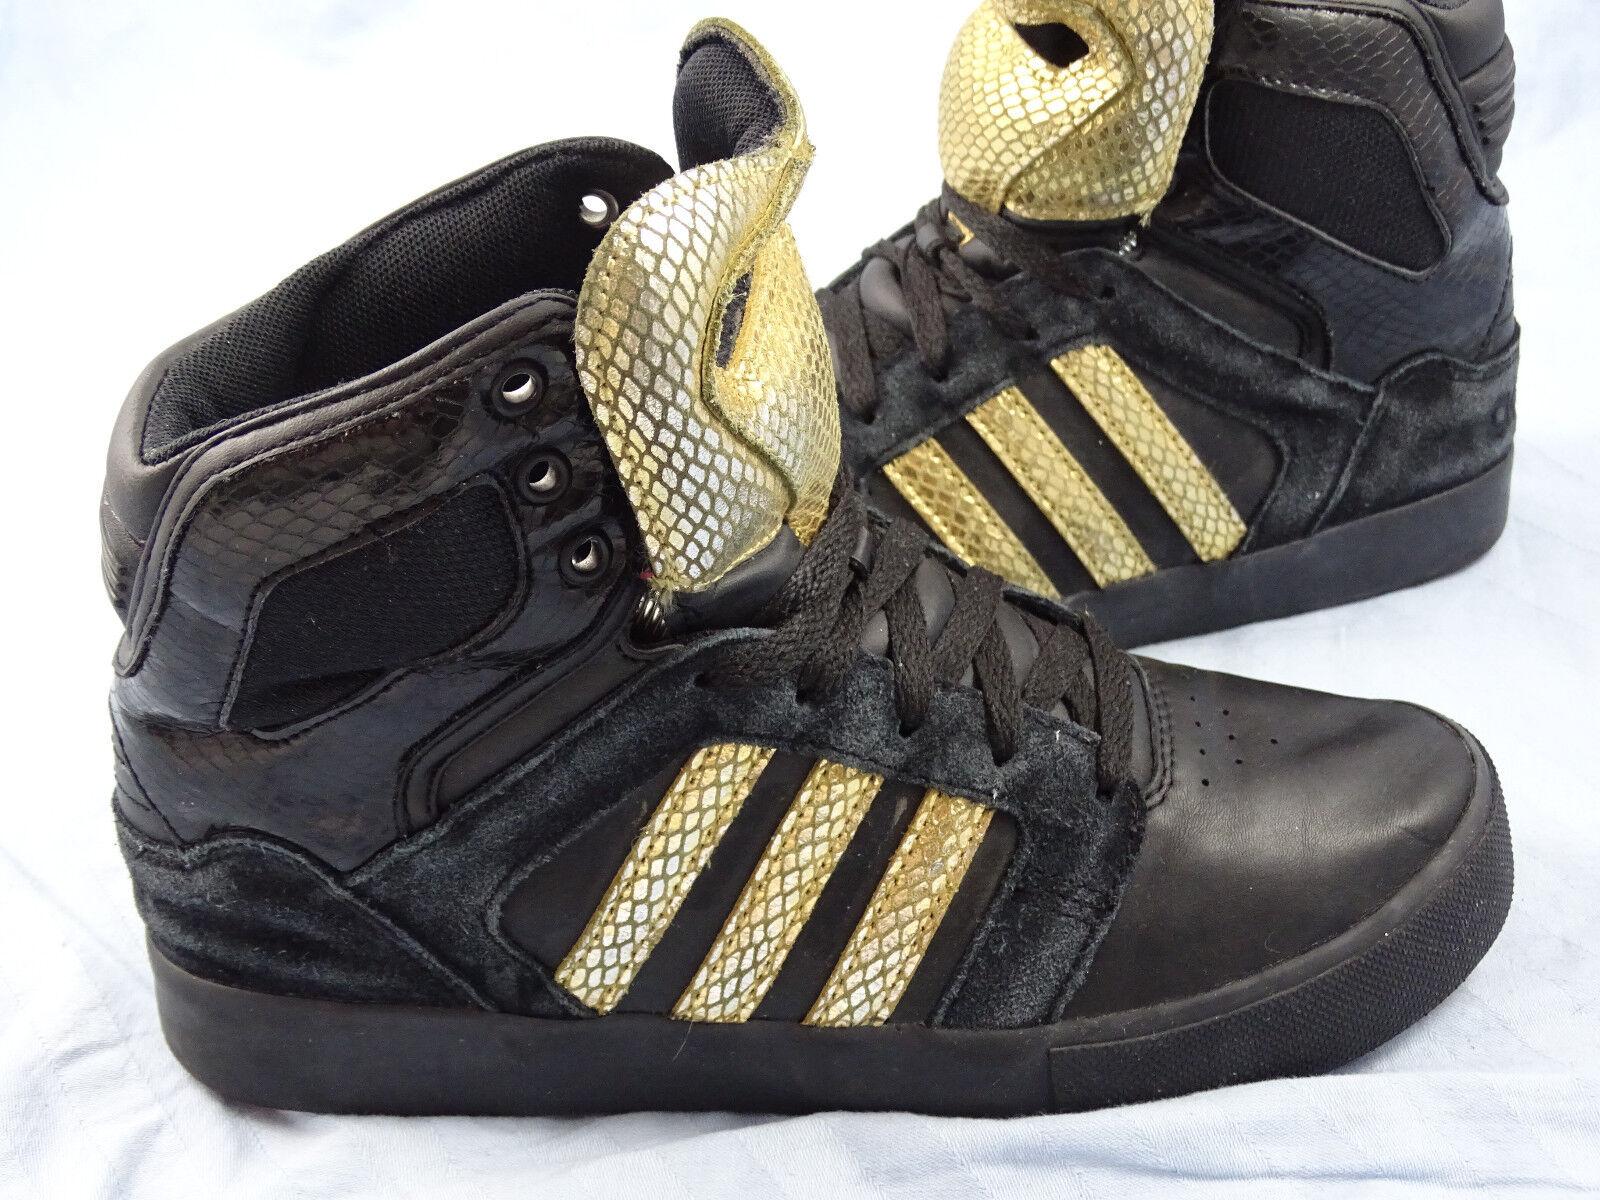 Hitop Entretenu Adidas X Bbneo Entretenu 8n0wmN